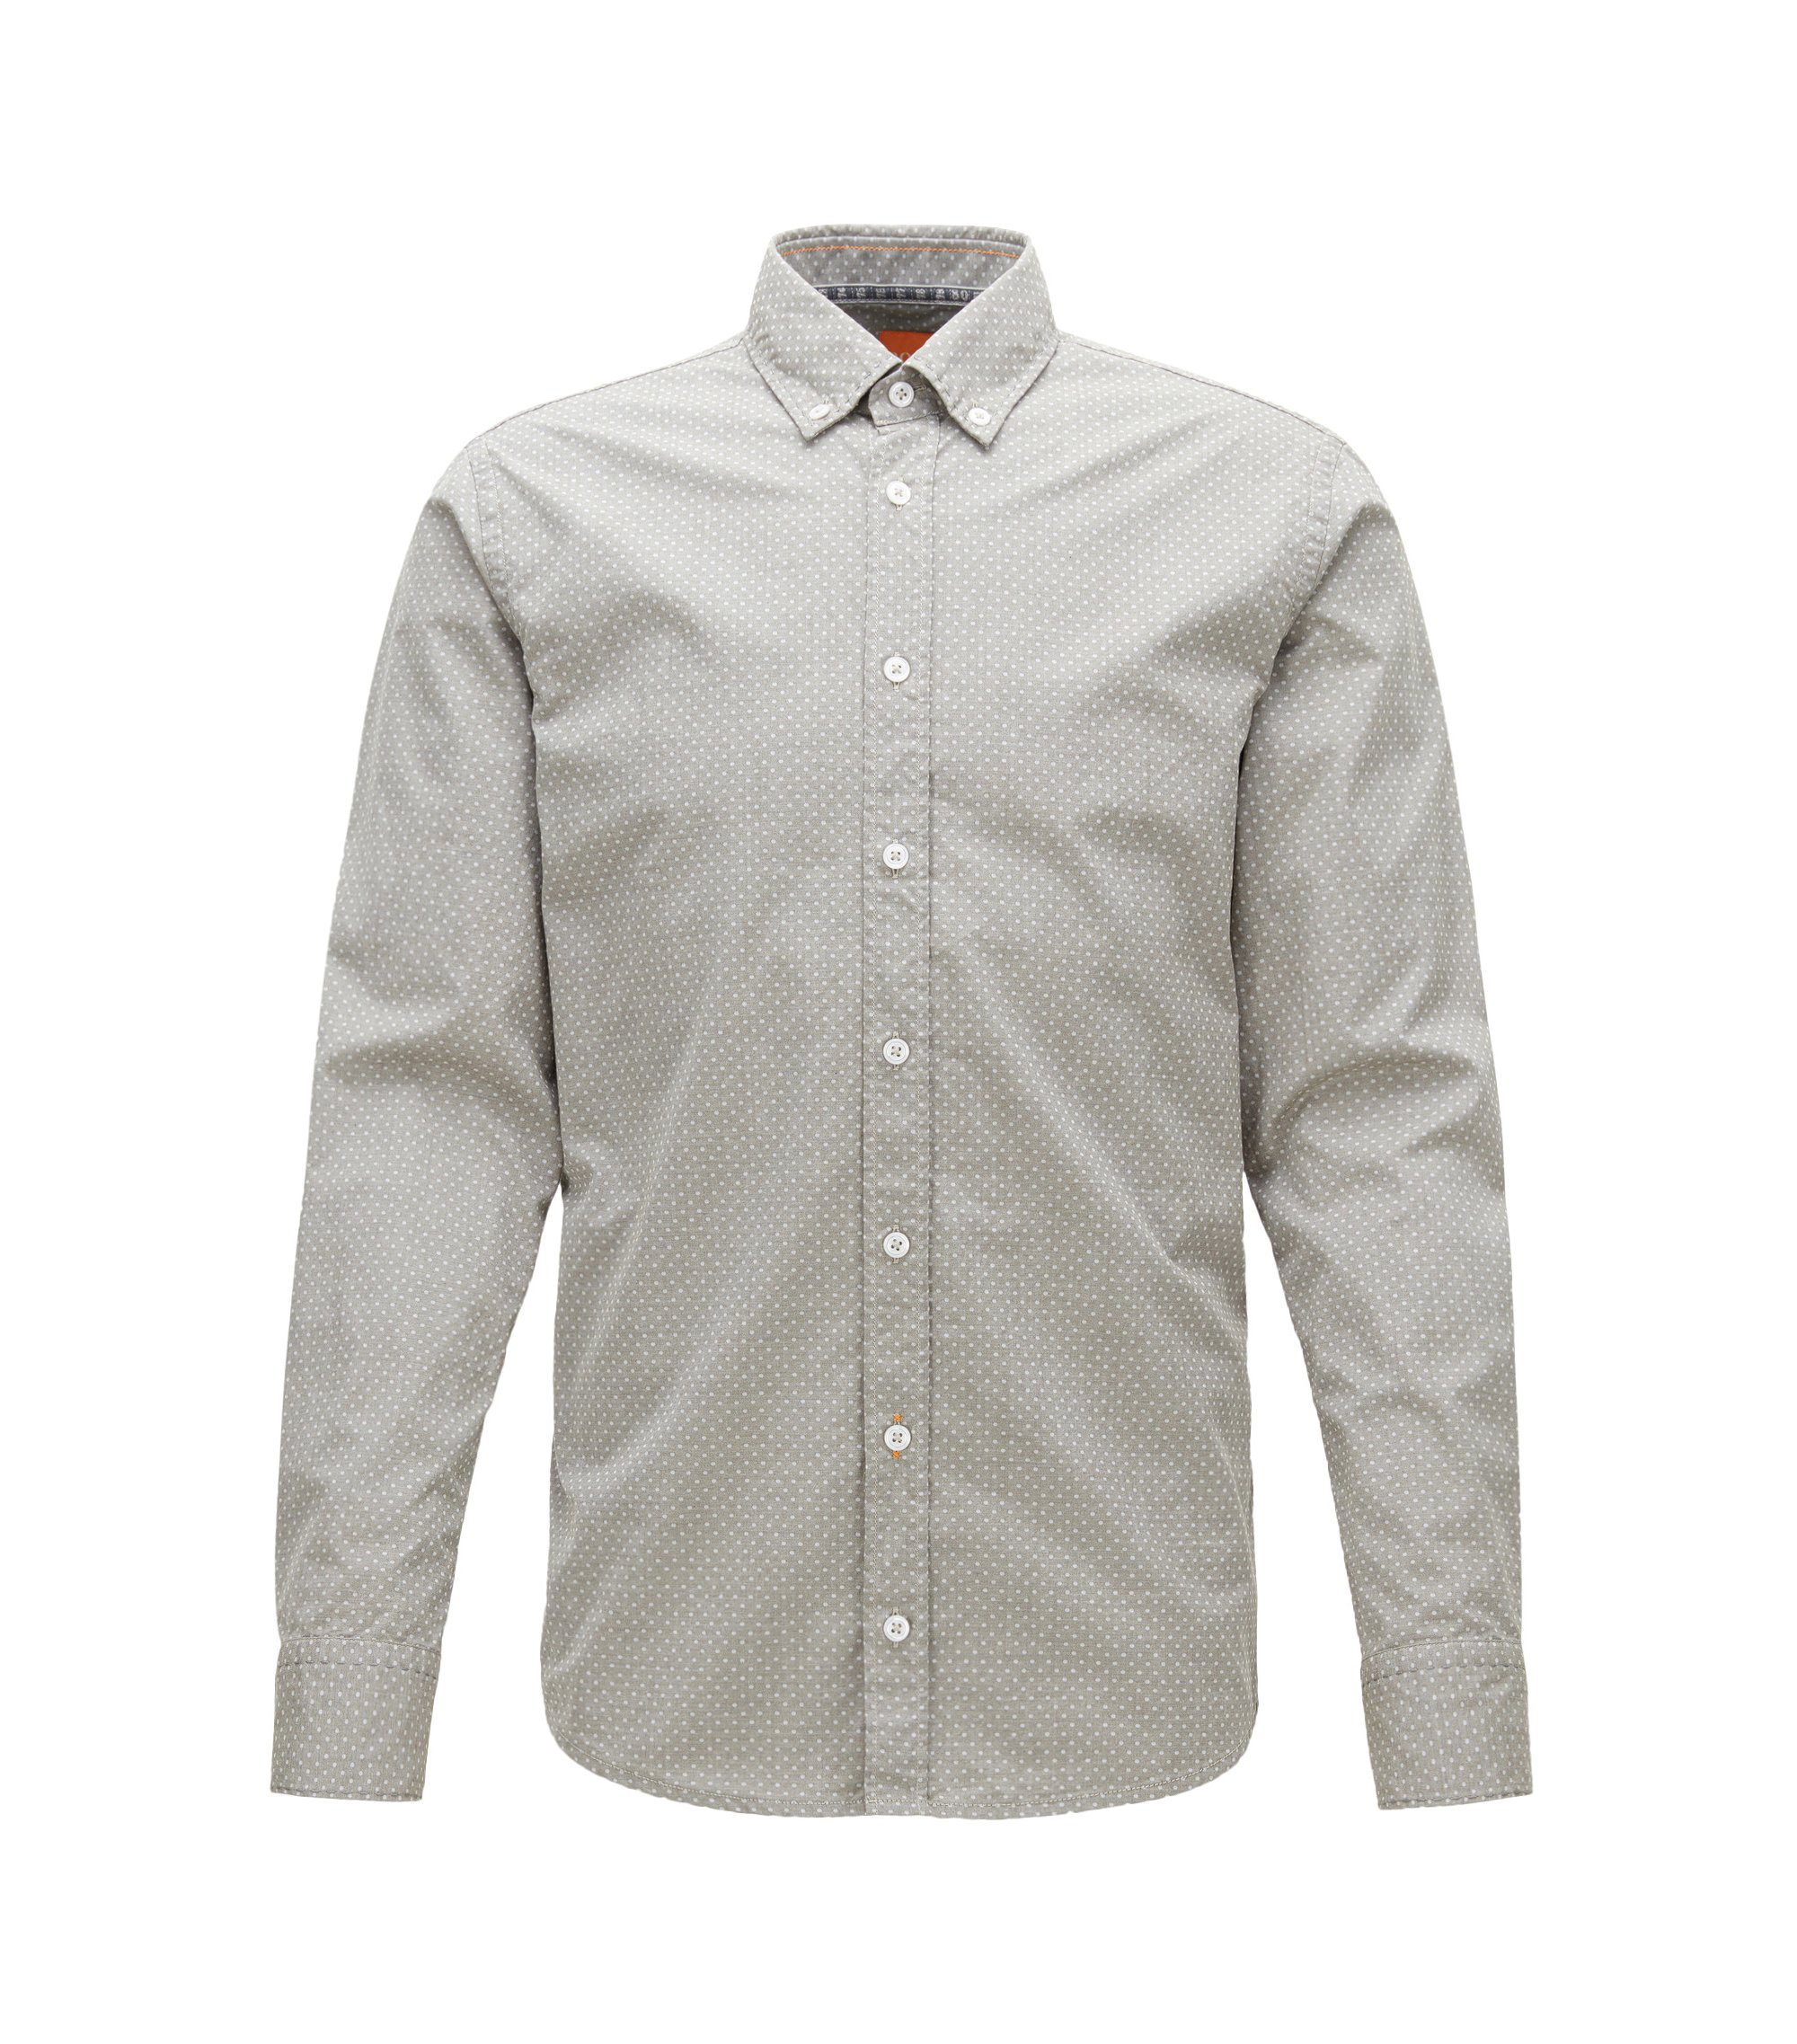 Polka Dot Cotton Button Down Shirt, Slim Fit | Epreppy, Dark Green